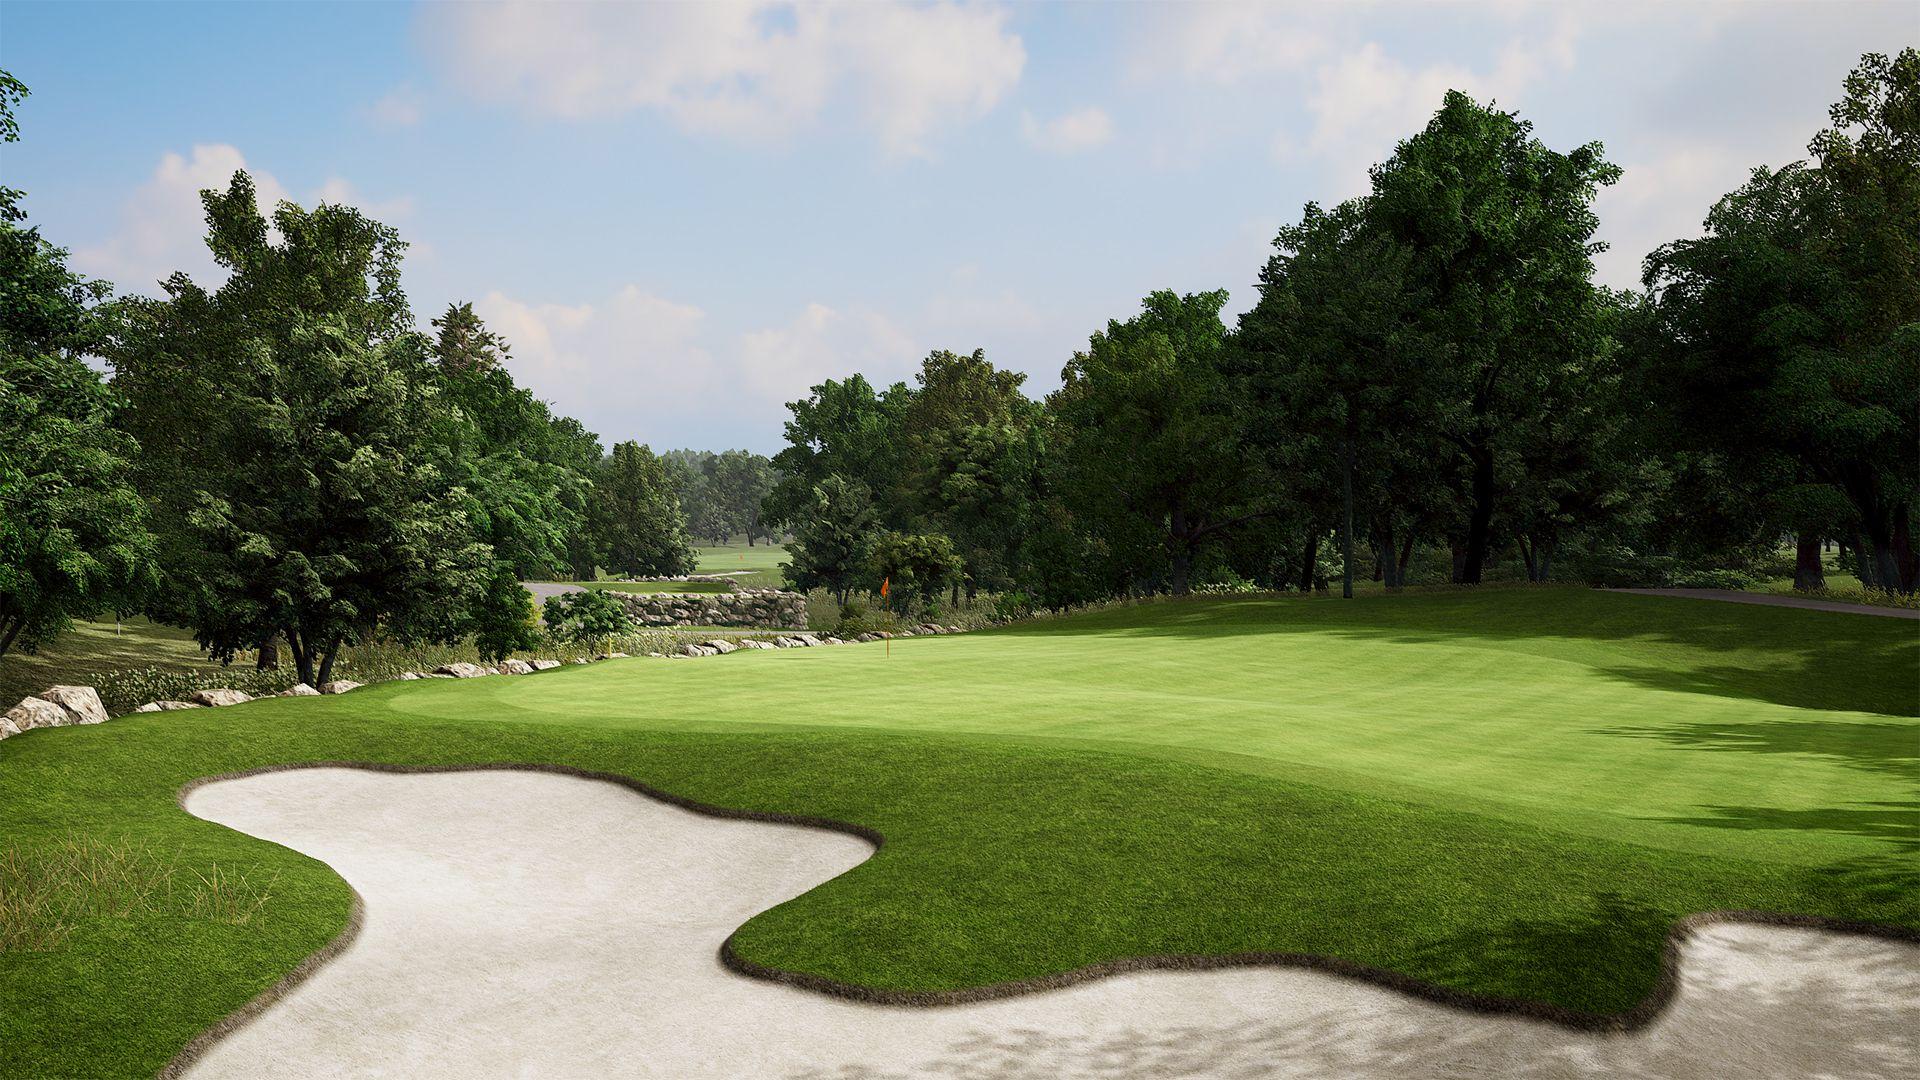 Trackman Golf Simulator Best Indoor Golf Simulator 2020 In 2020 Indoor Golf Simulator Golf Simulators Golf